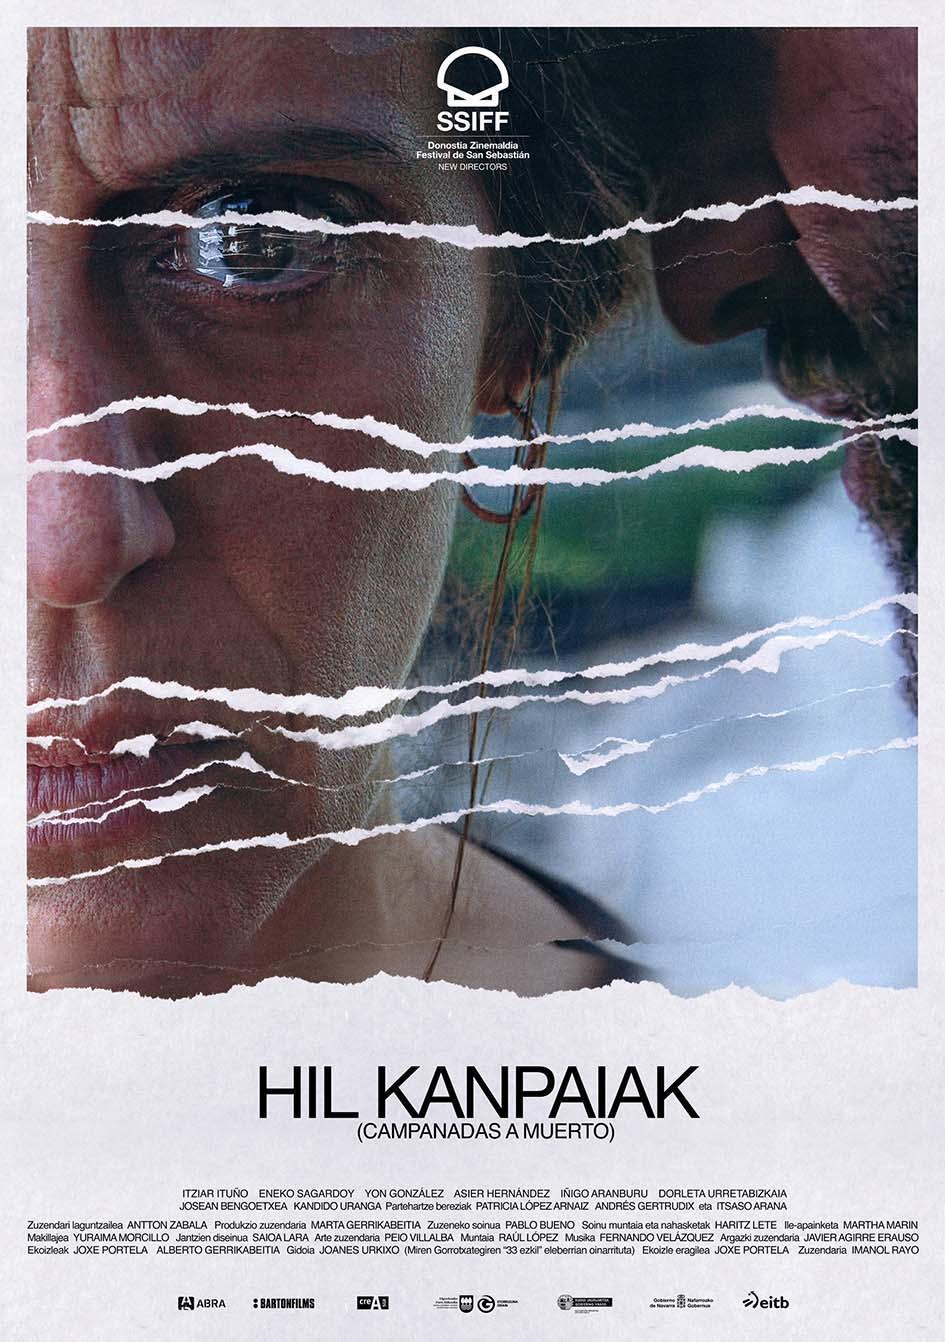 Cartel de Hil Kanpaiak (Campanadas a muerto)